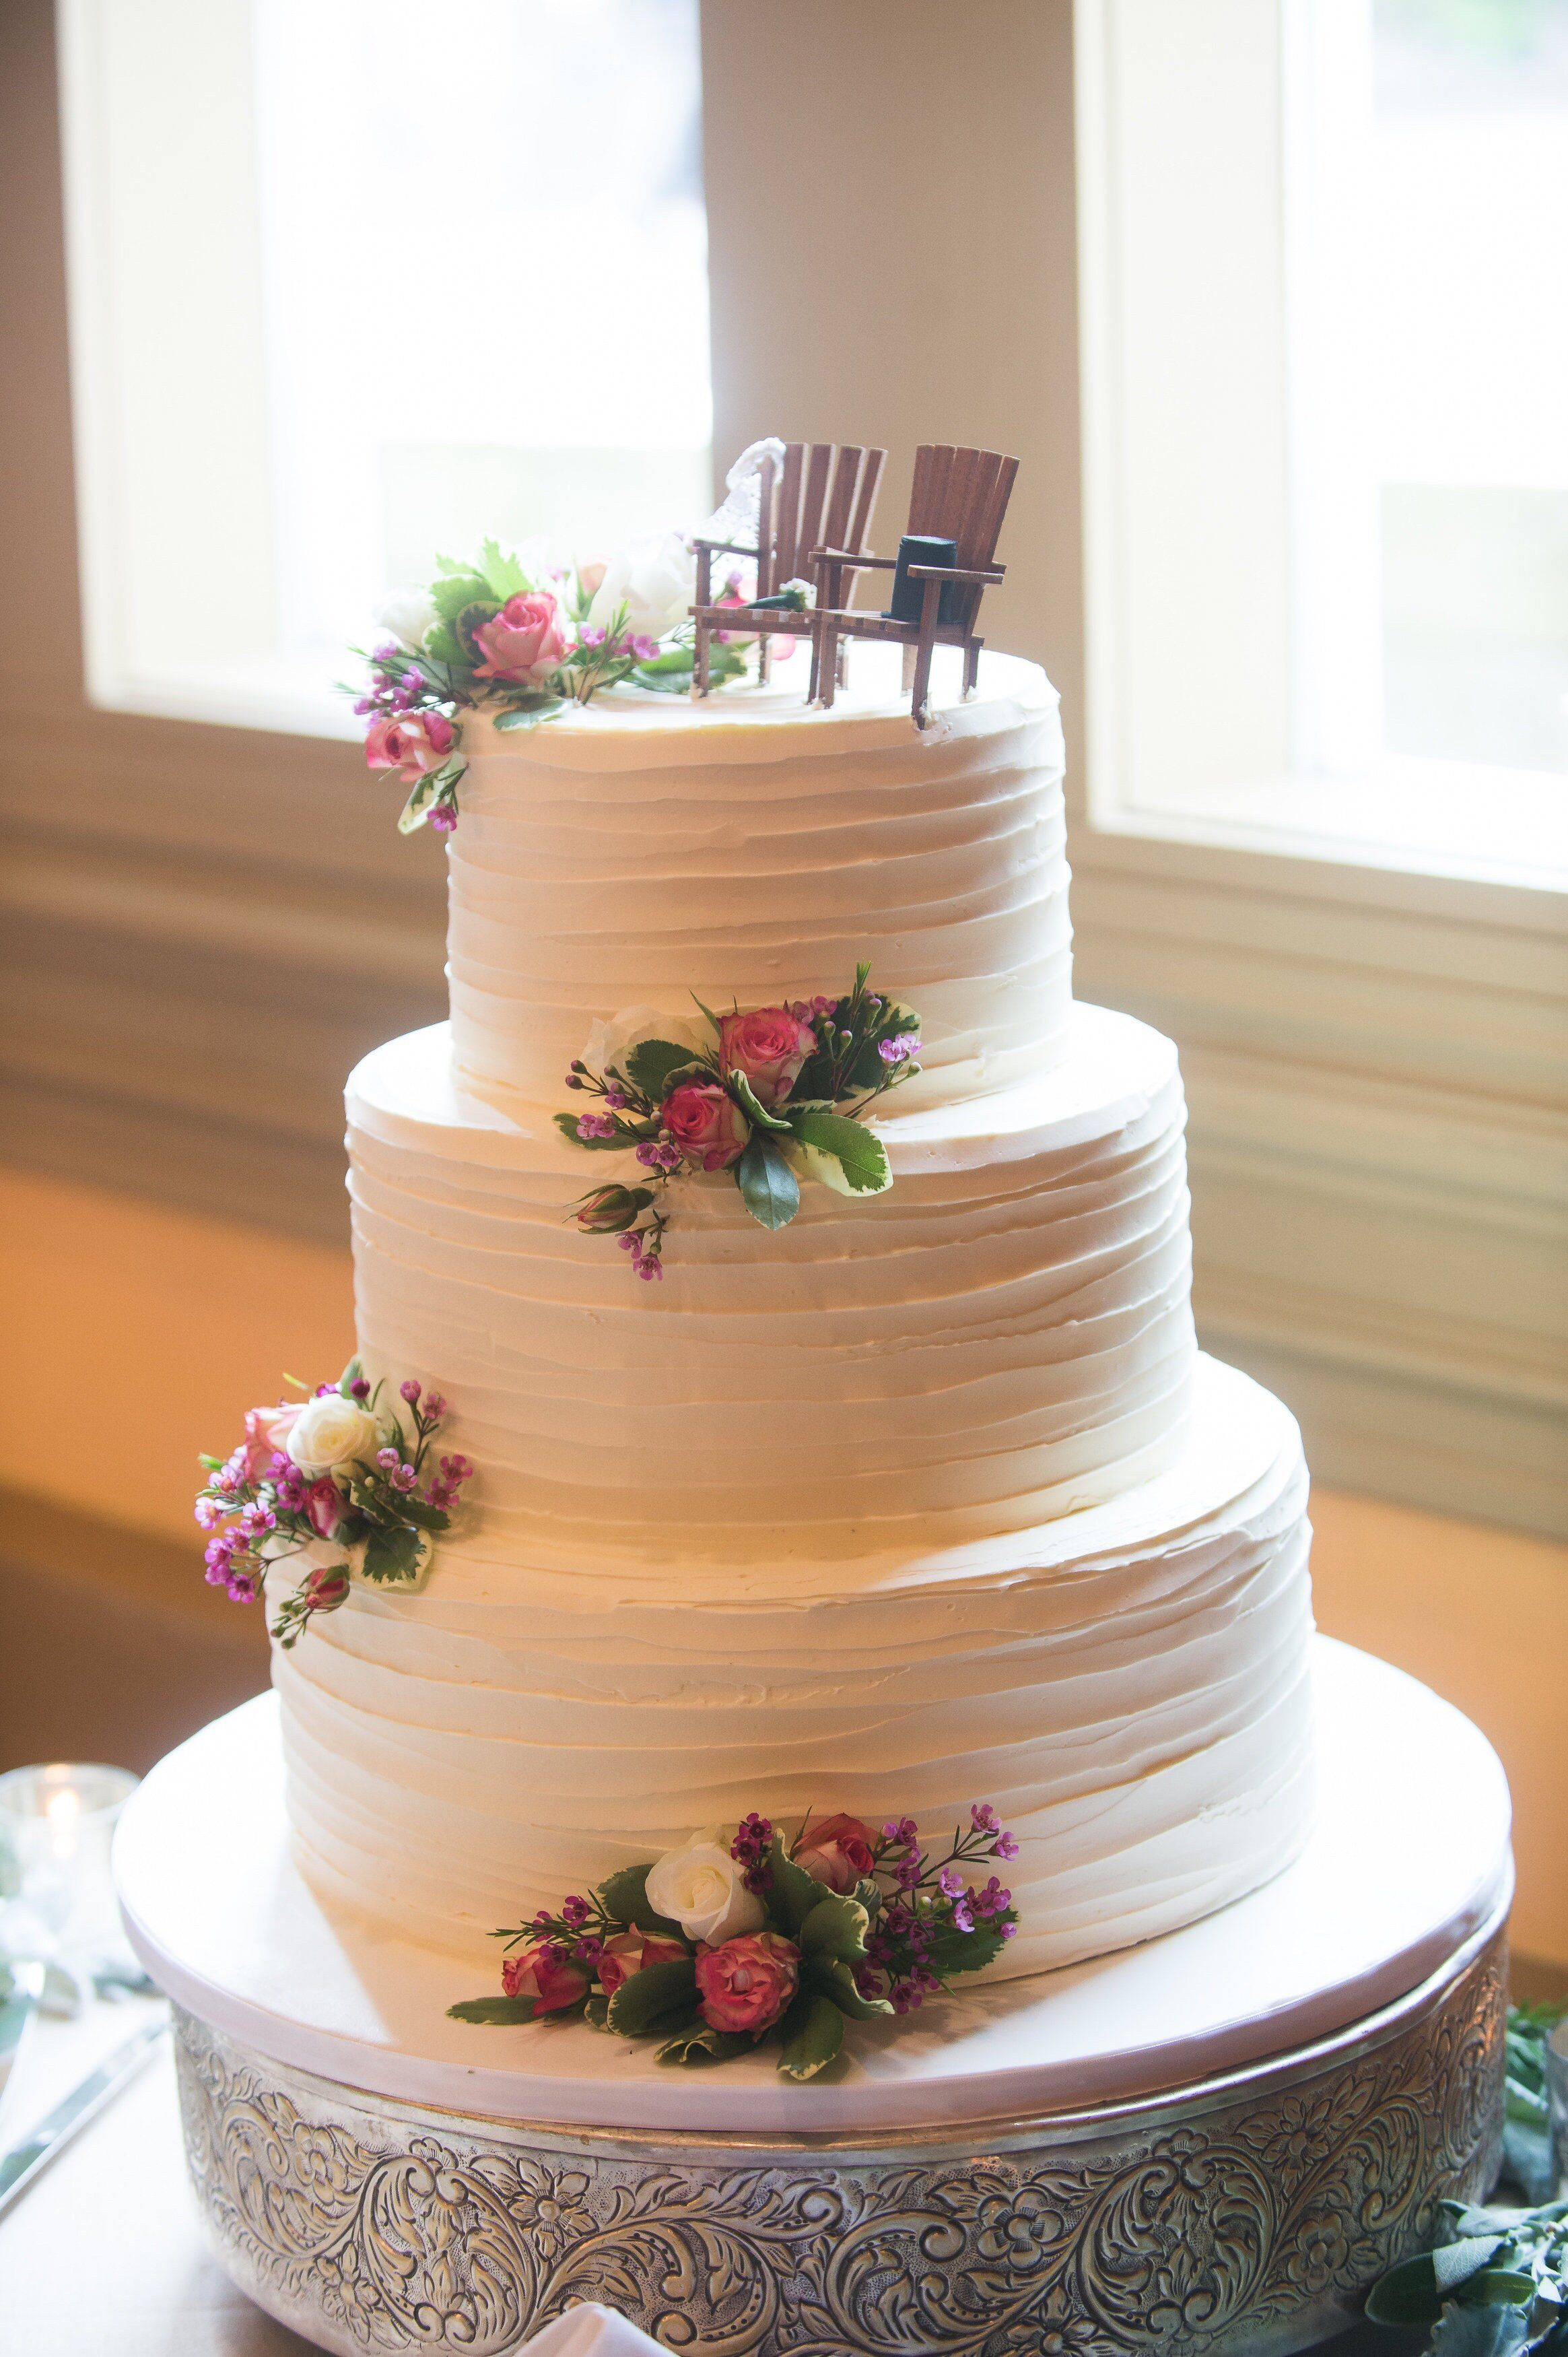 Chocolate Cake Decoration Ideas Elegant the 15 Mon Cake